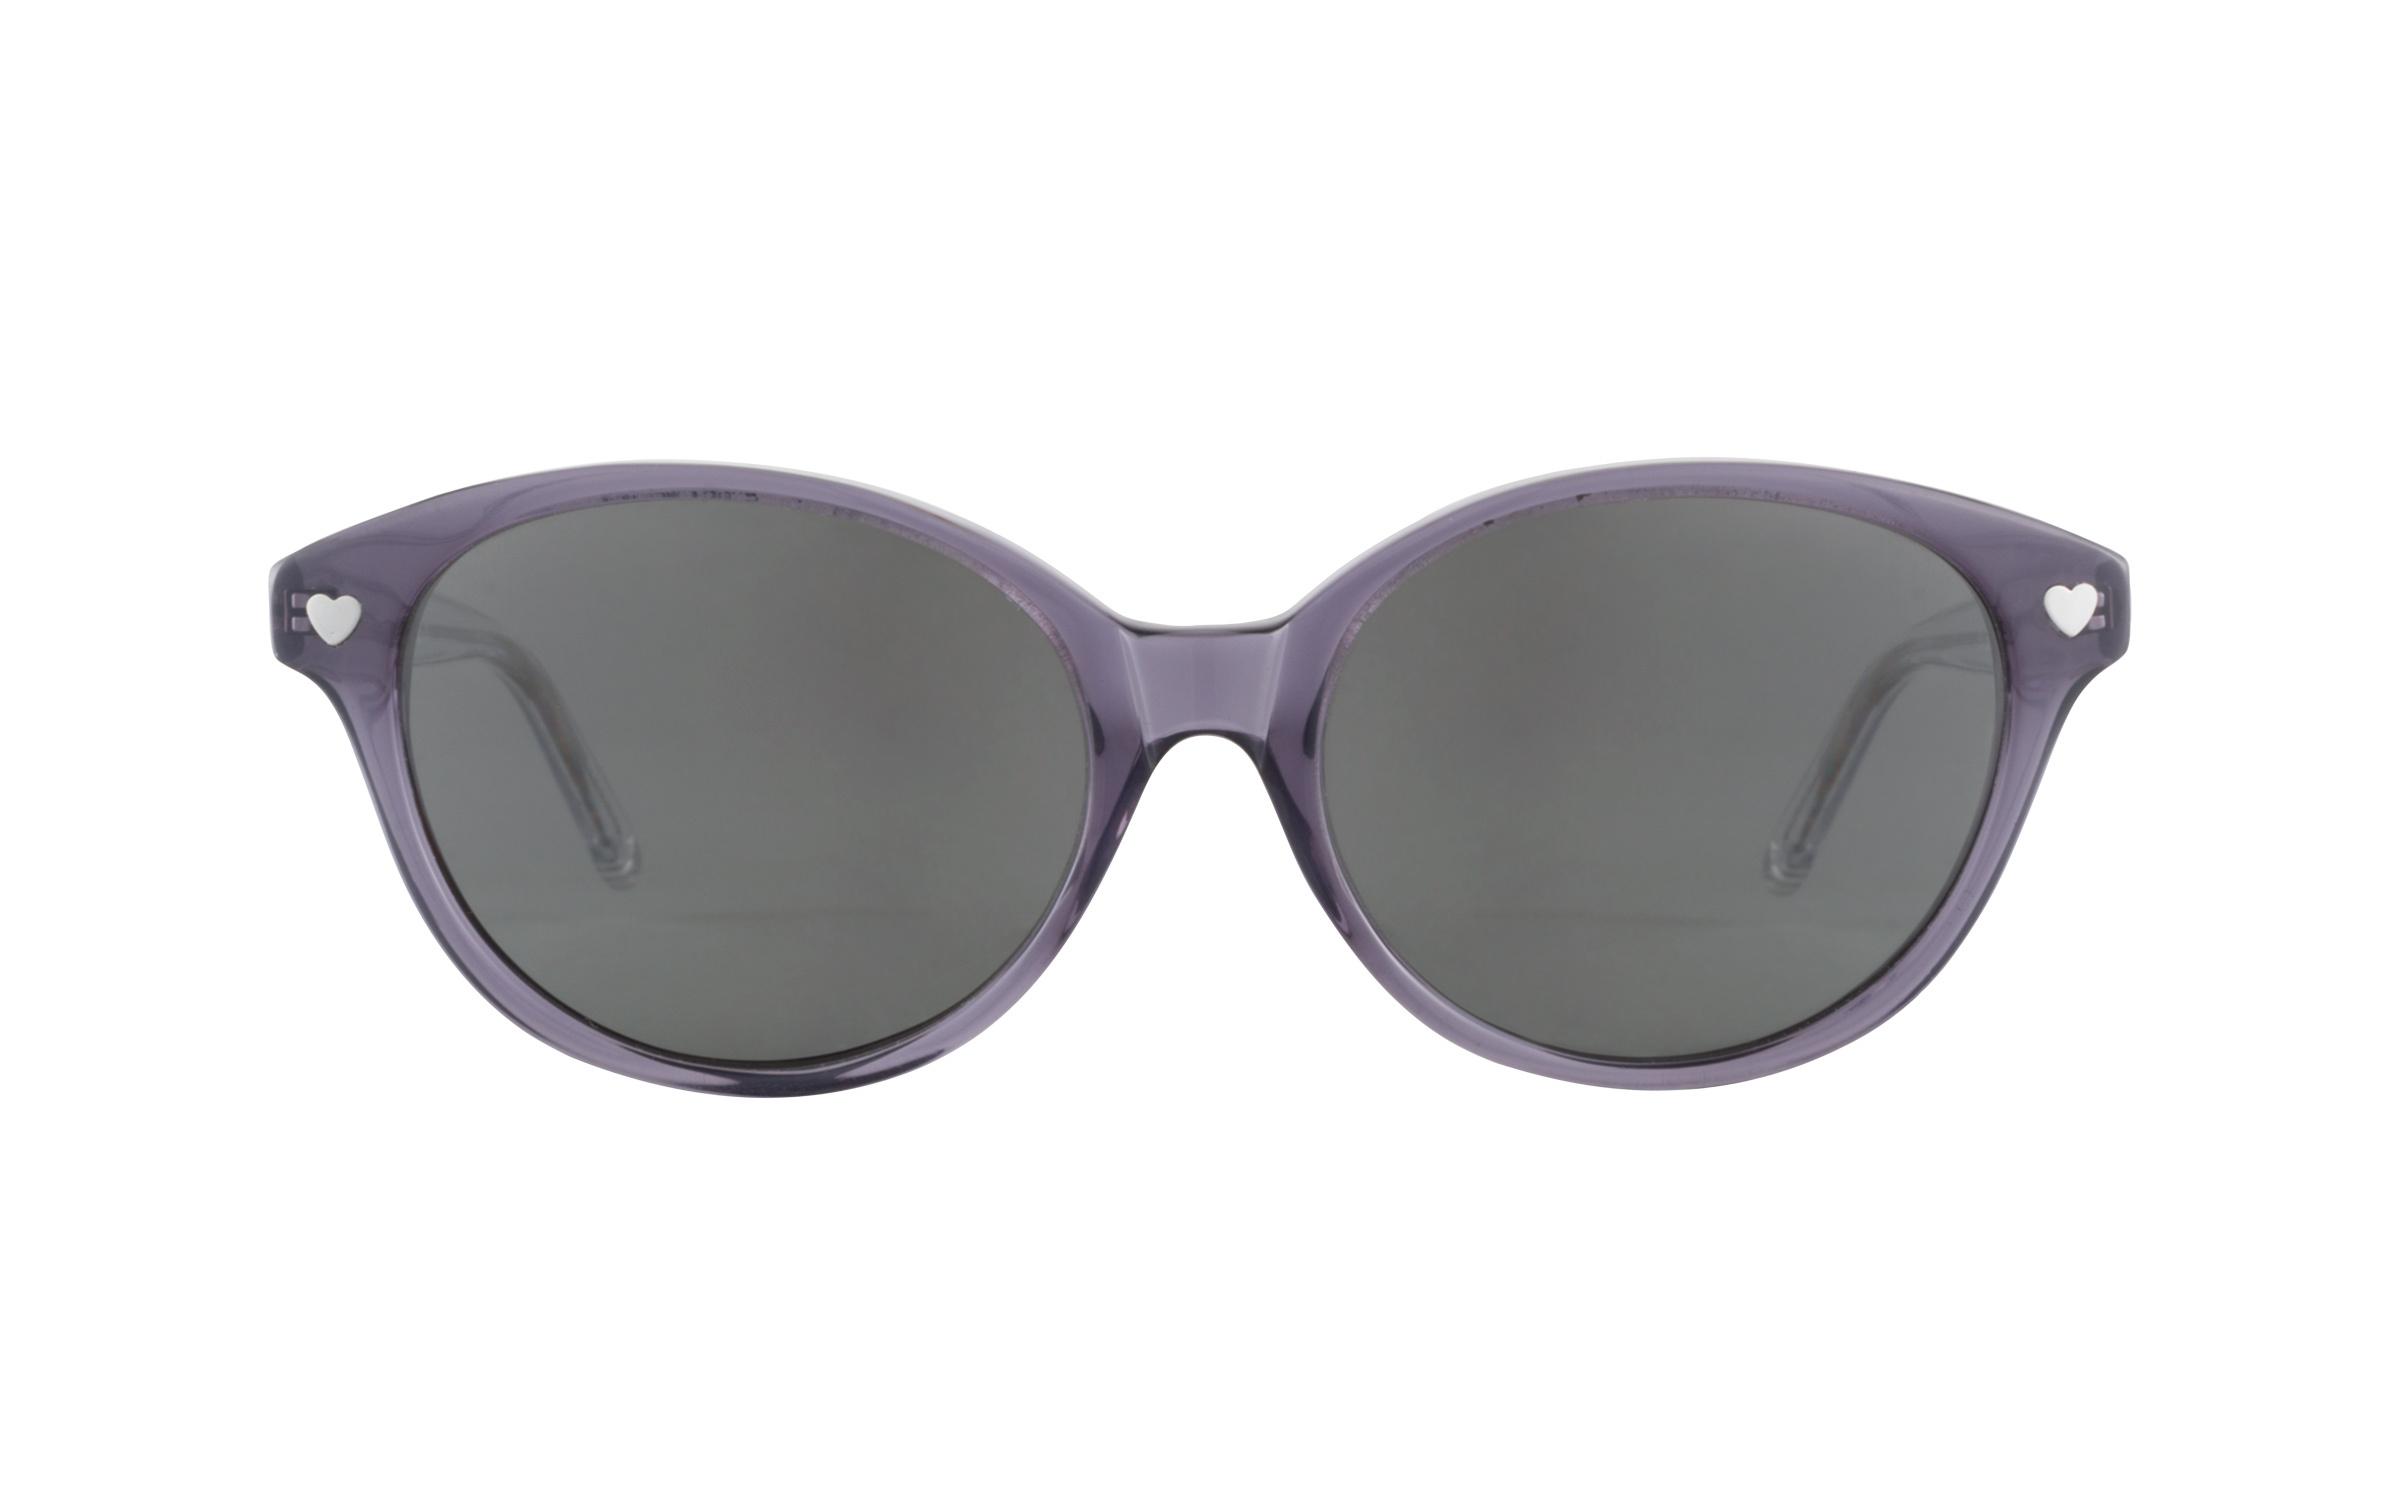 Love_Sunglasses_Geek_Grey_Online_Coastal